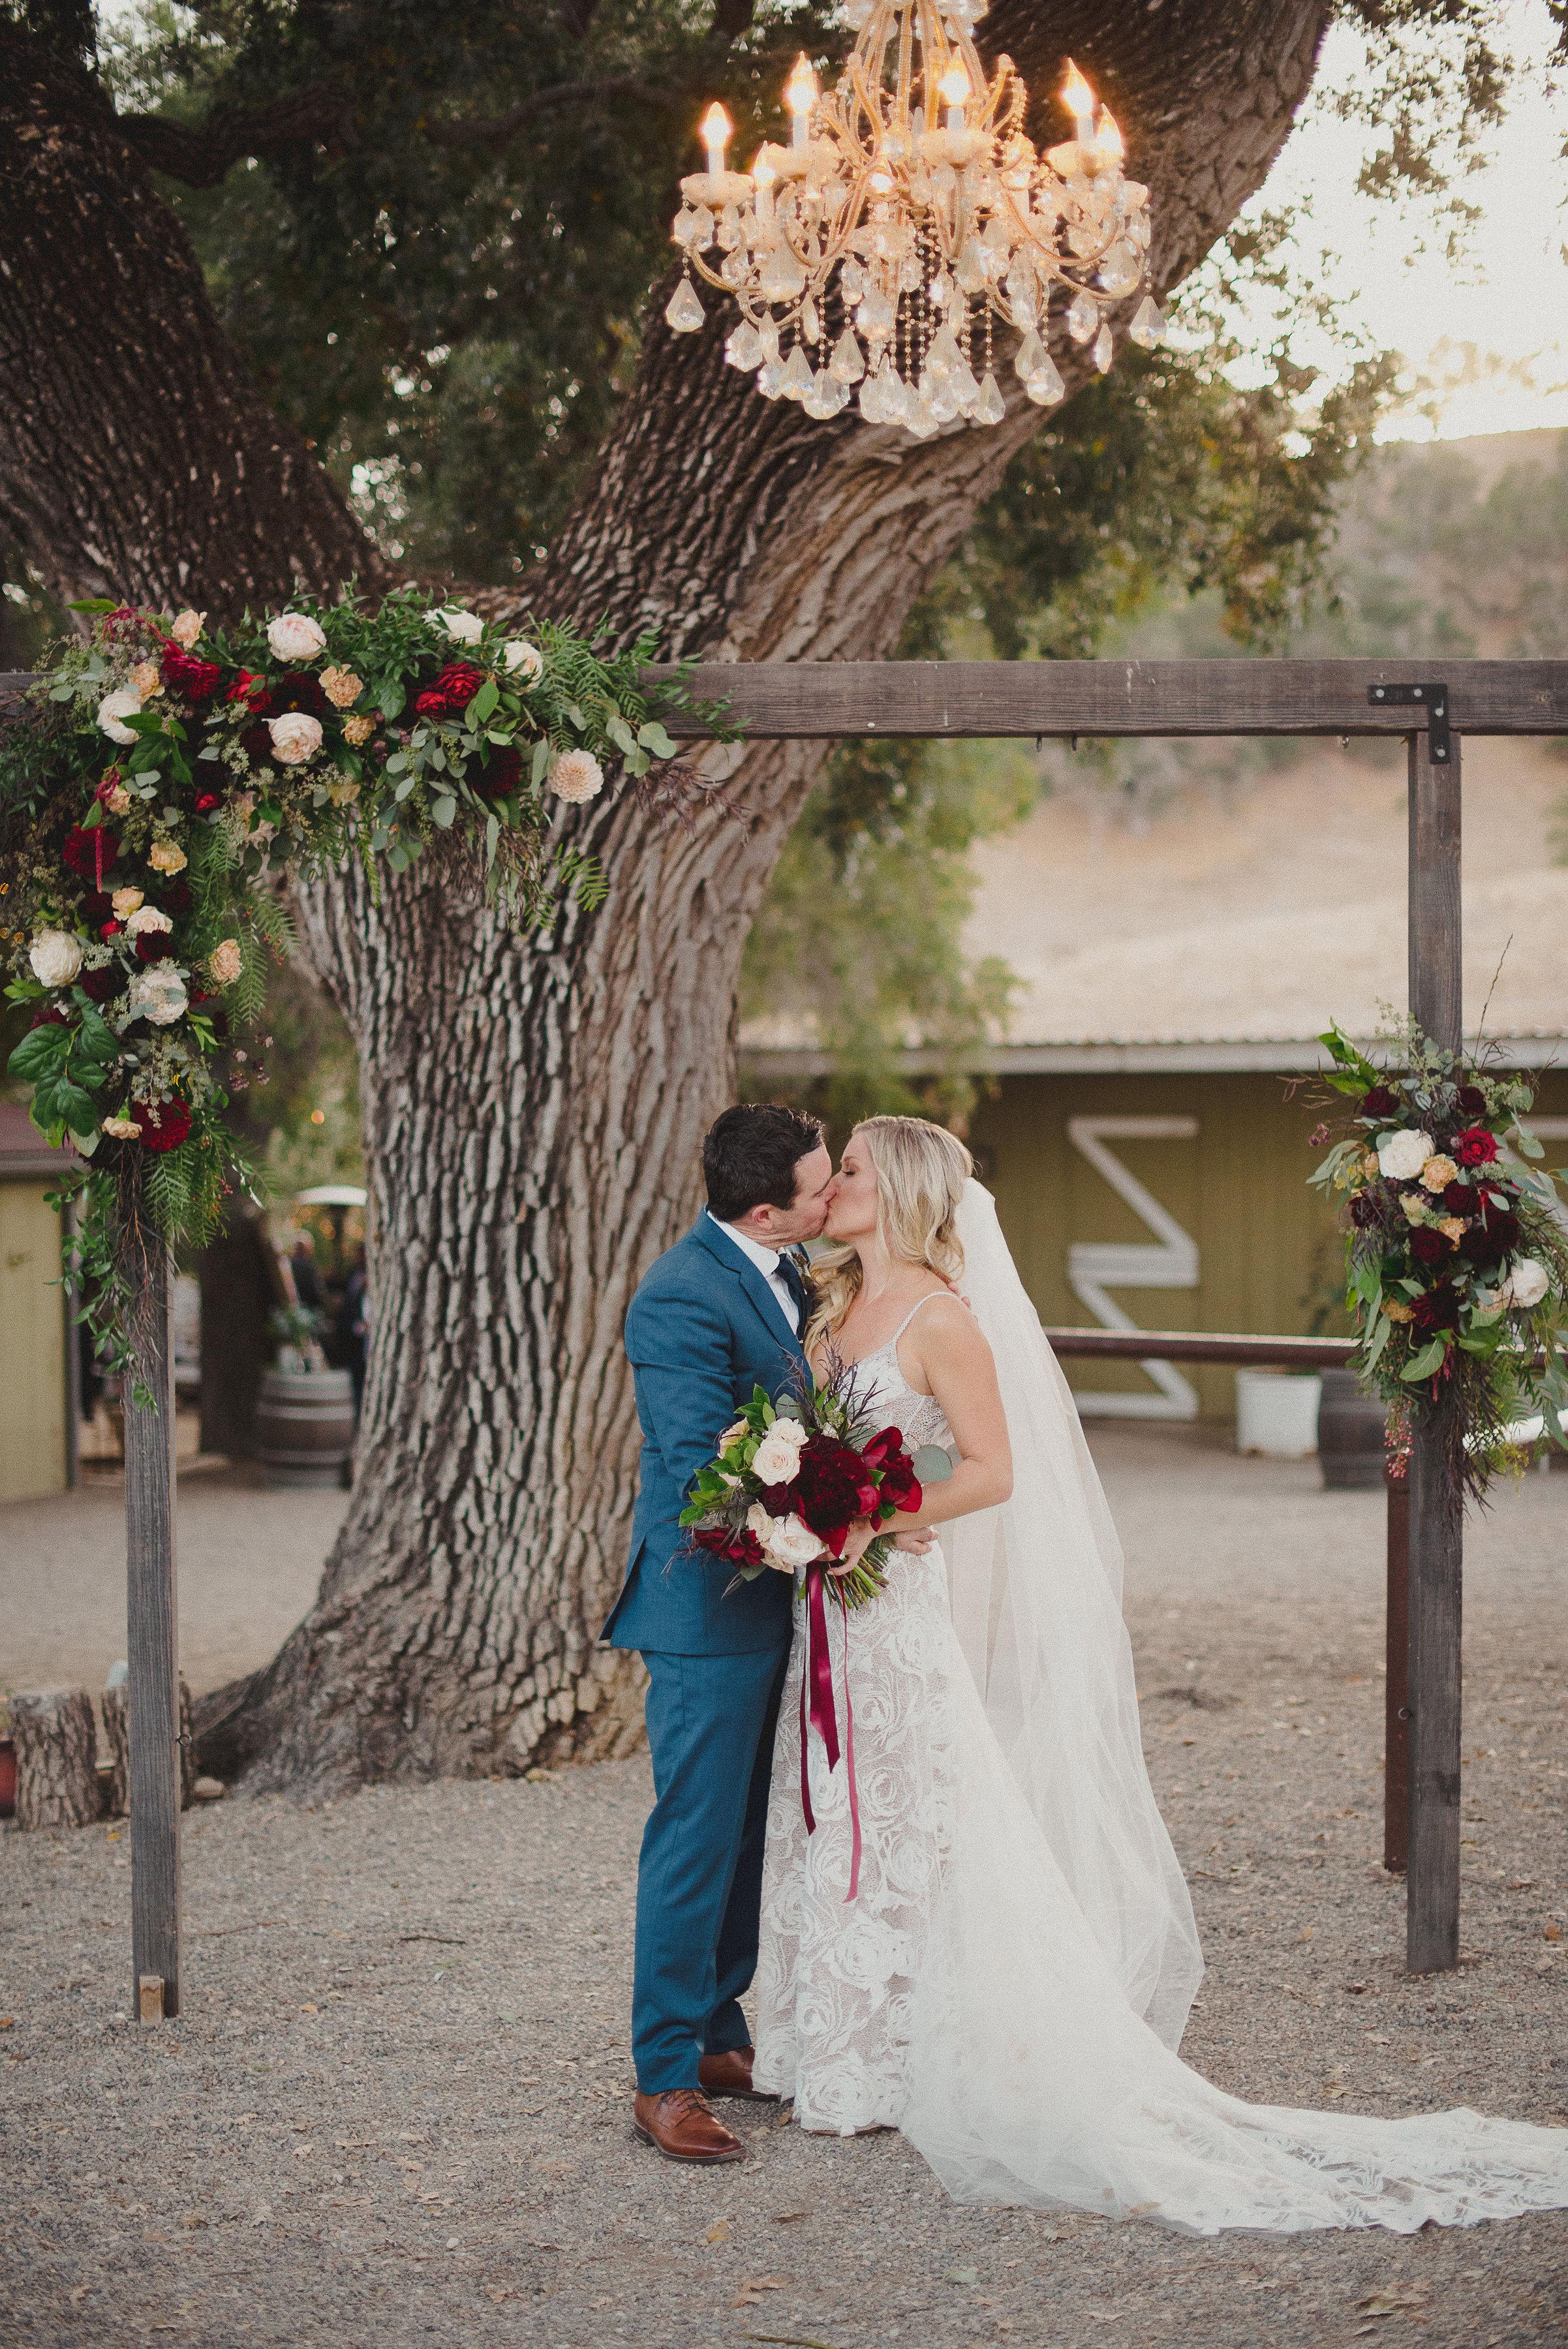 181026-Marisa-JB-Wedding-4936.jpg